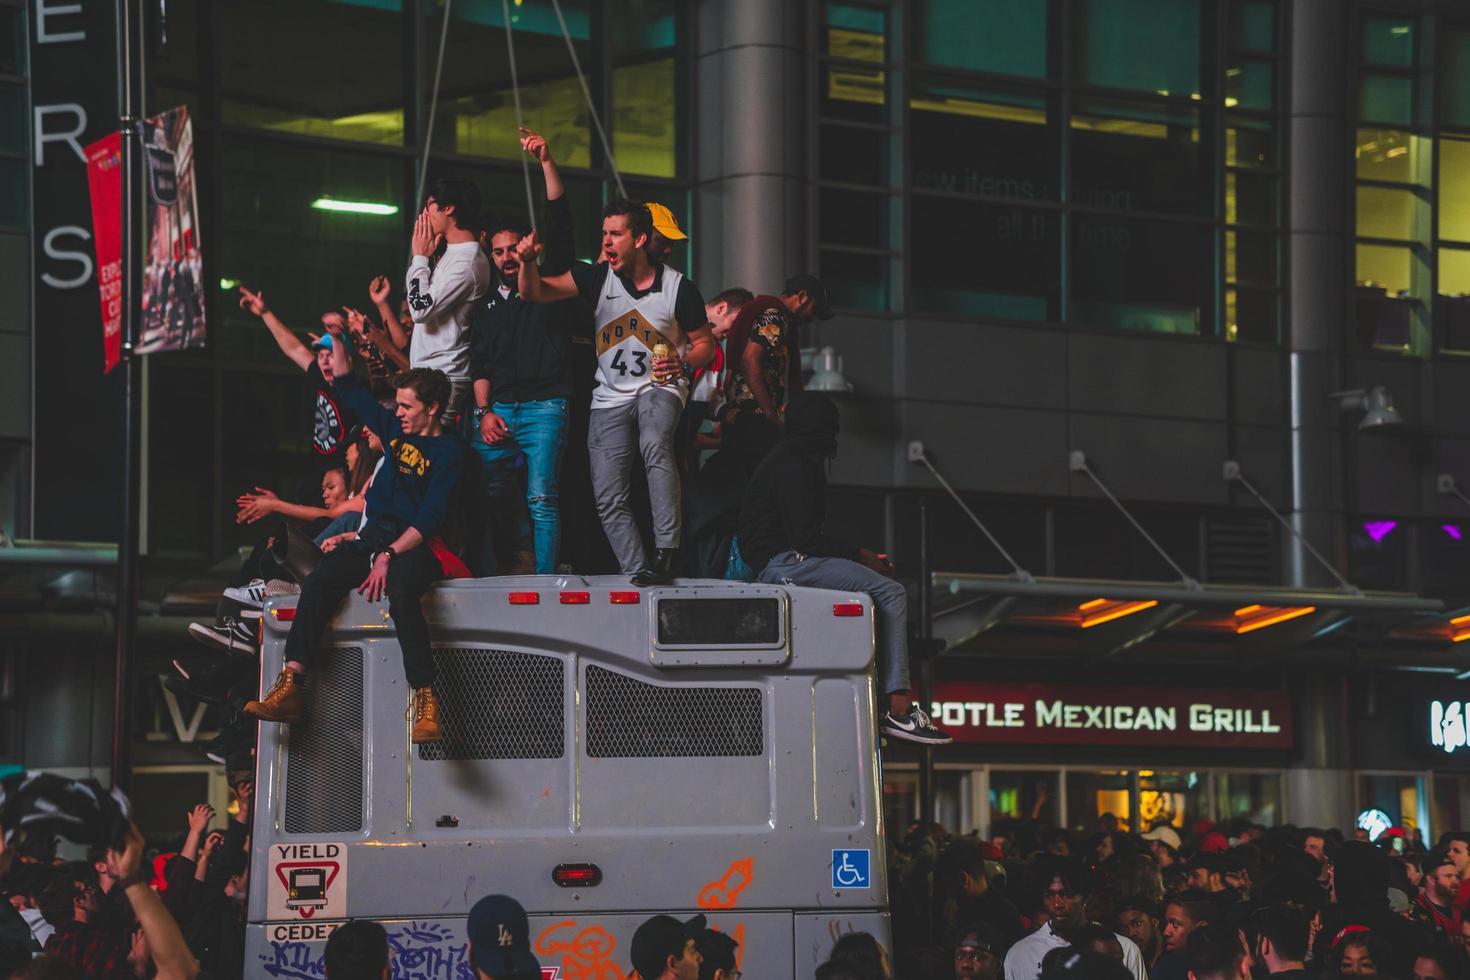 Unidentified people celebrating the Toronto Raptors photo